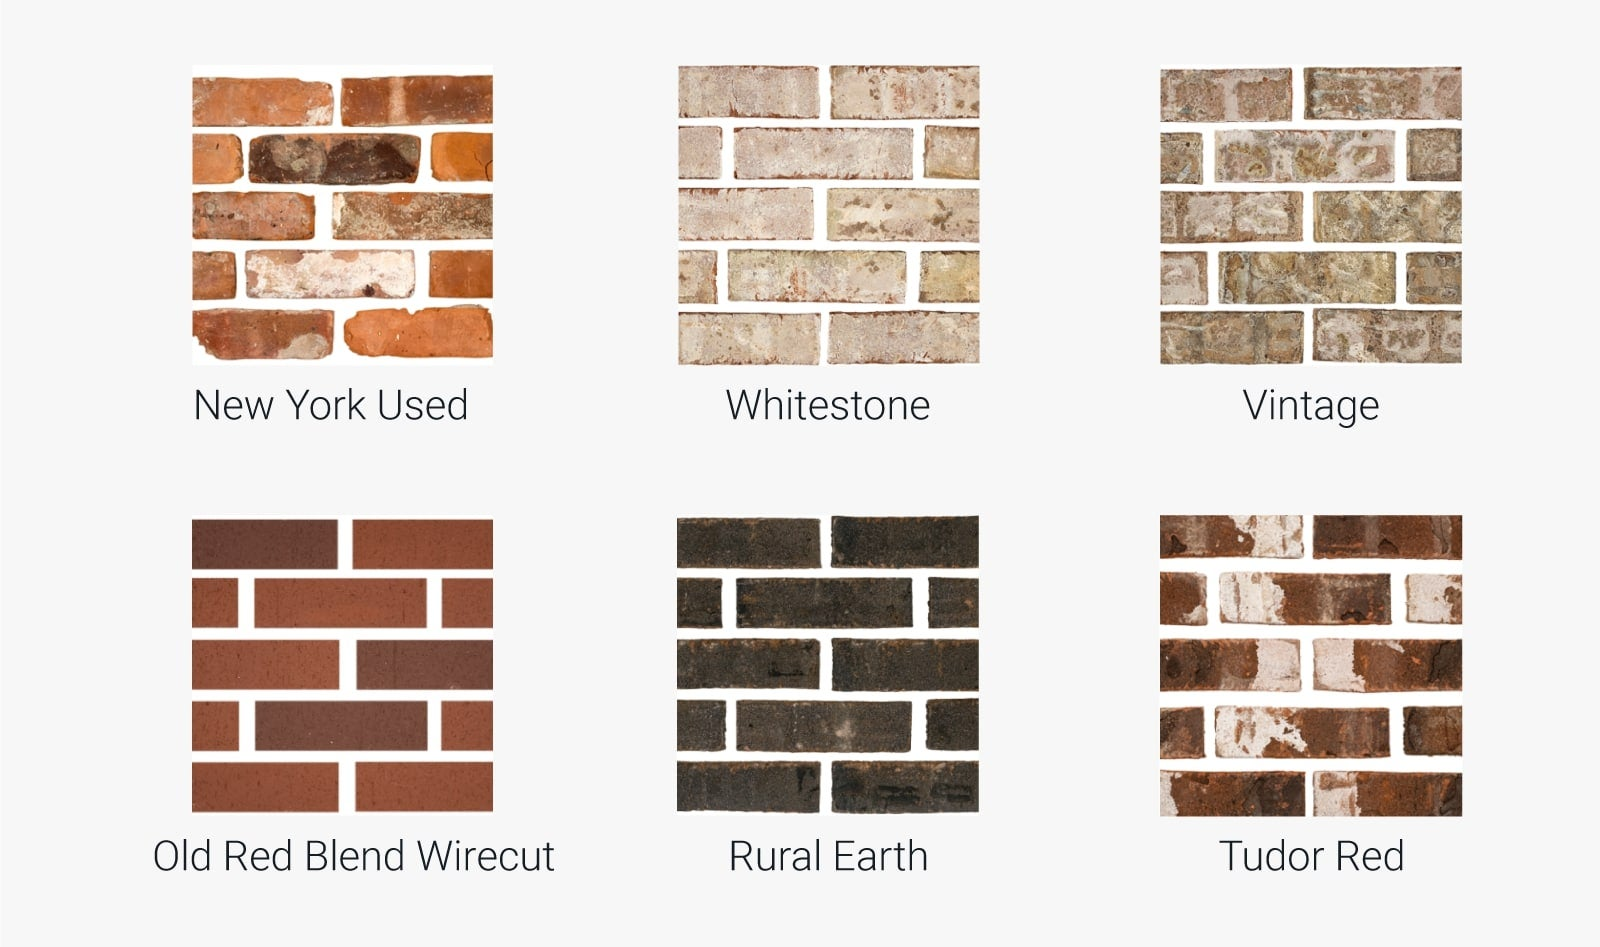 Different types of brick siding